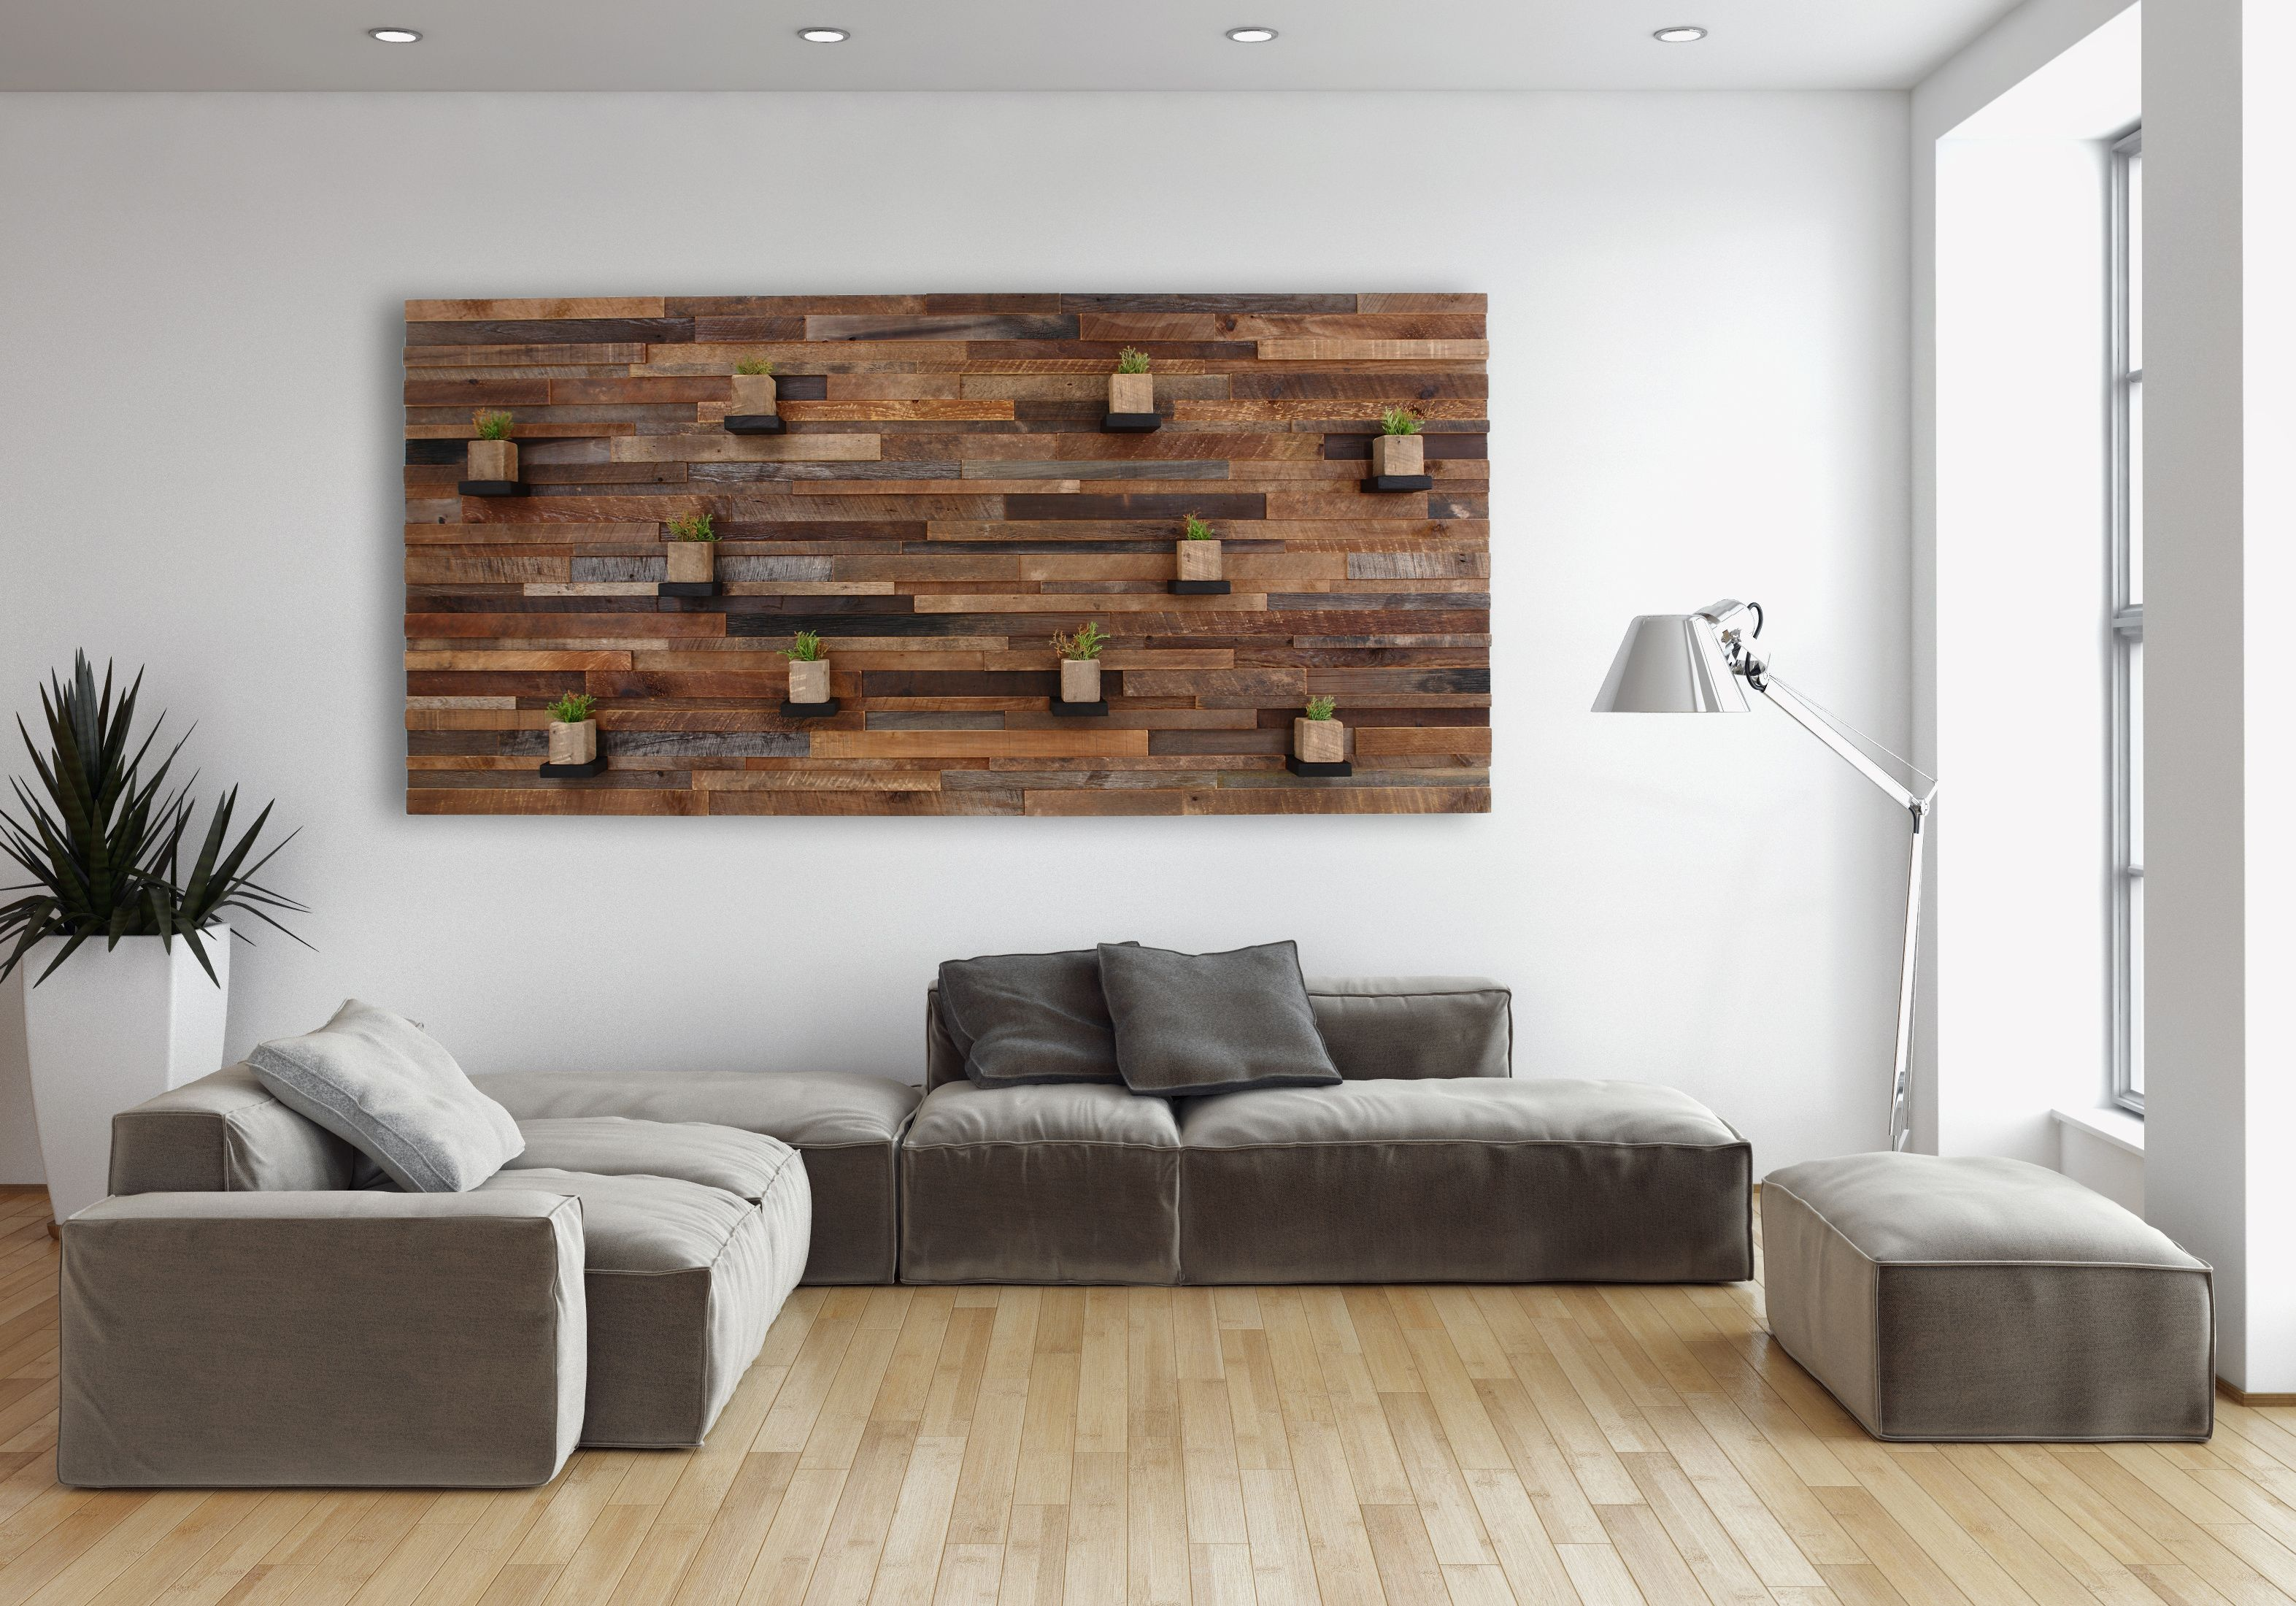 Custom Made Wood Wall Art With Floating Shelves Reclaimed Barnwood